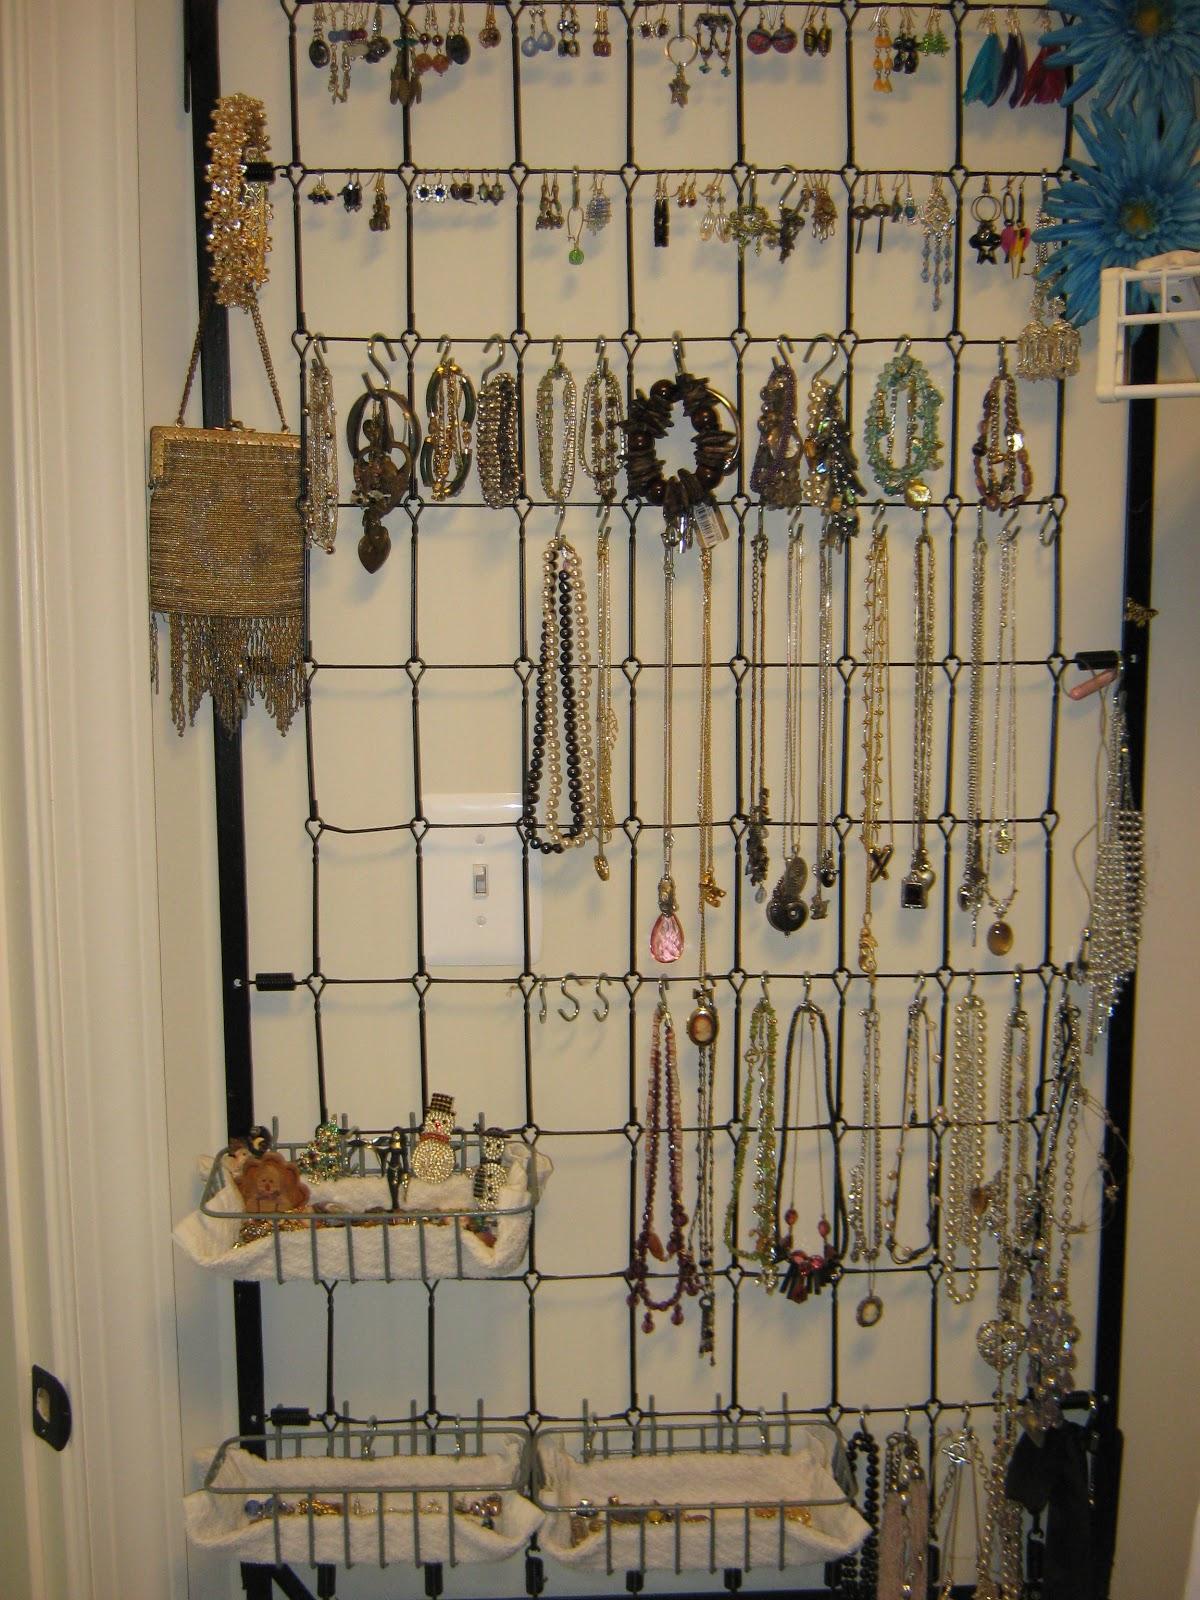 Fake It Frugal Crib Spring Jewelry Organizer